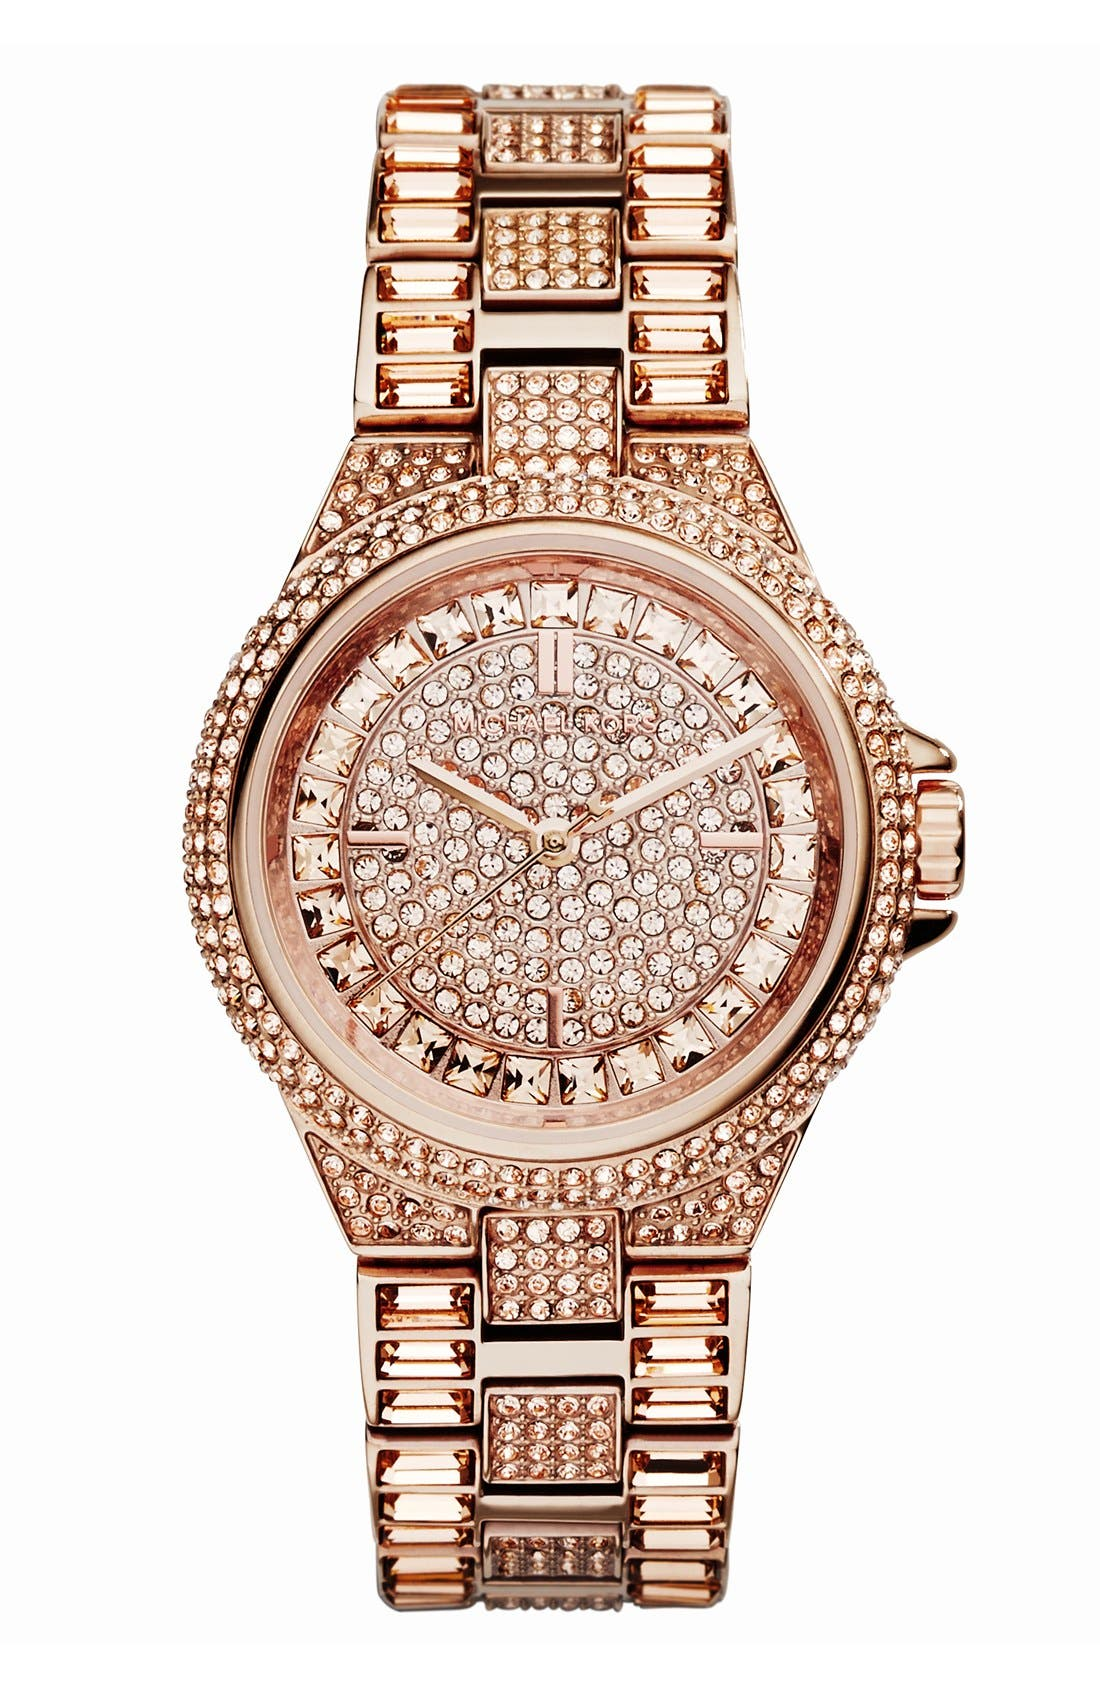 Alternate Image 1 Selected - Michael Kors 'Mini Camille' Crystal Encrusted Bracelet Watch, 33mm